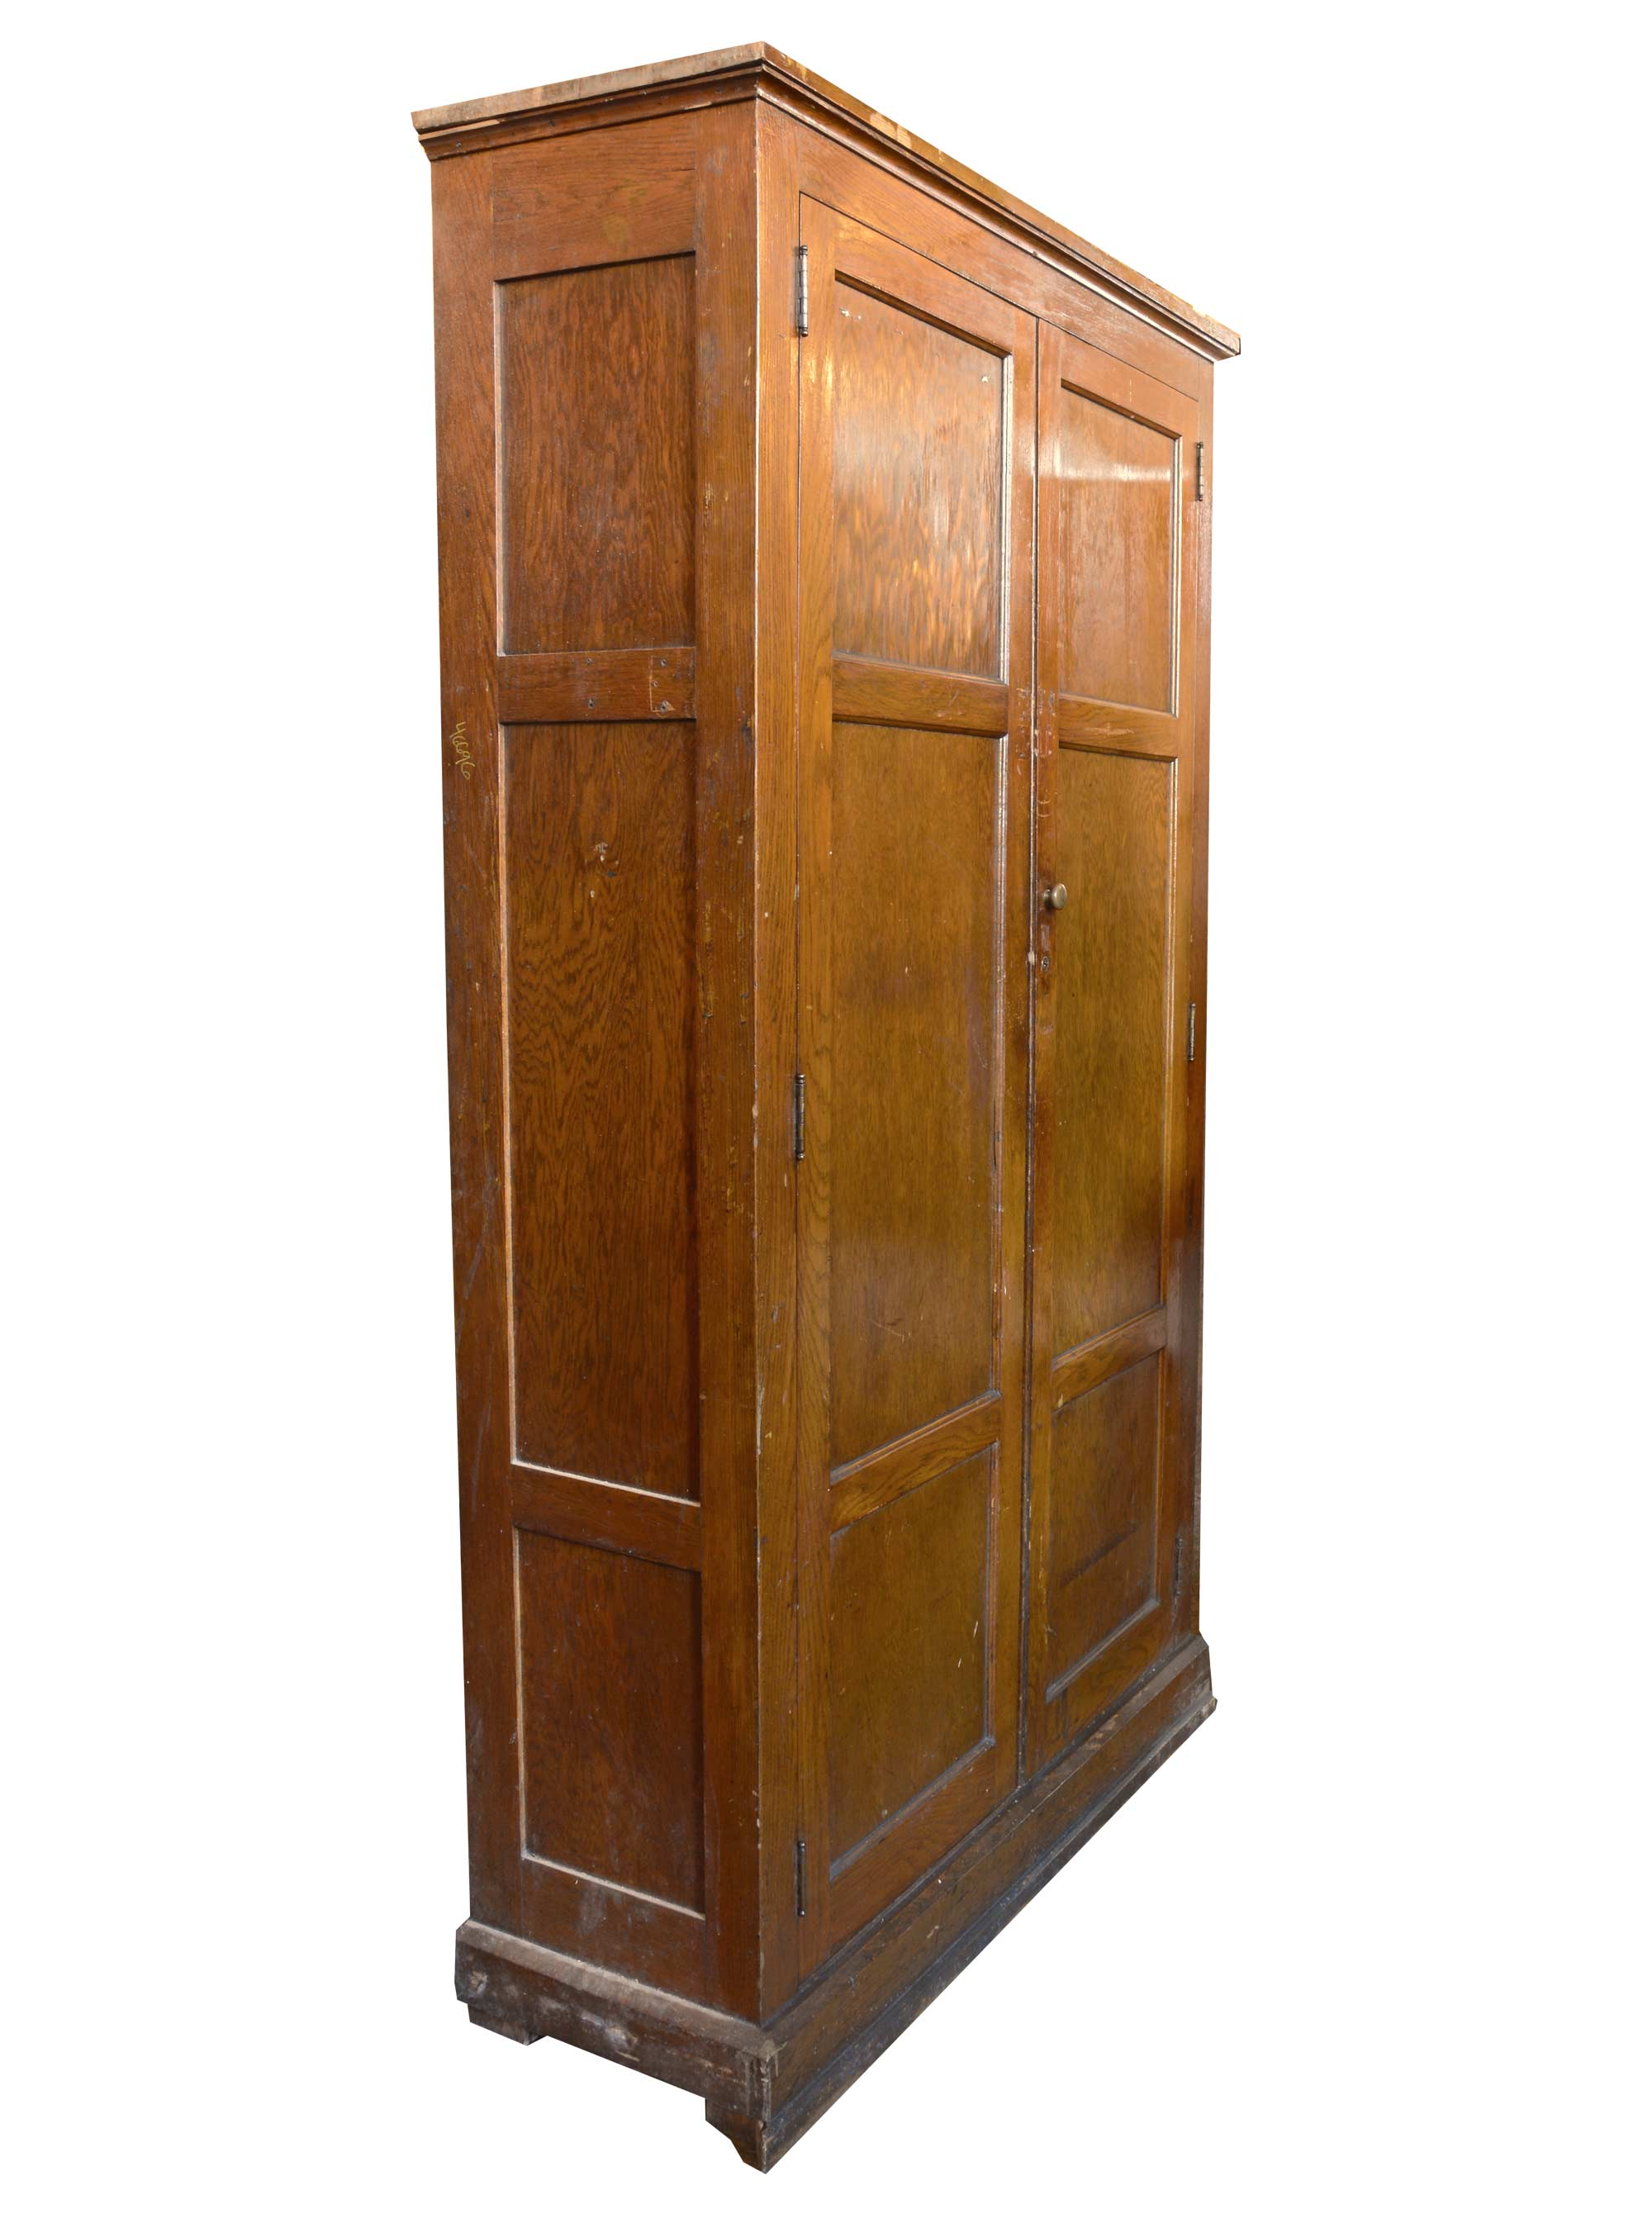 46696-school-cabinet-angle.jpg